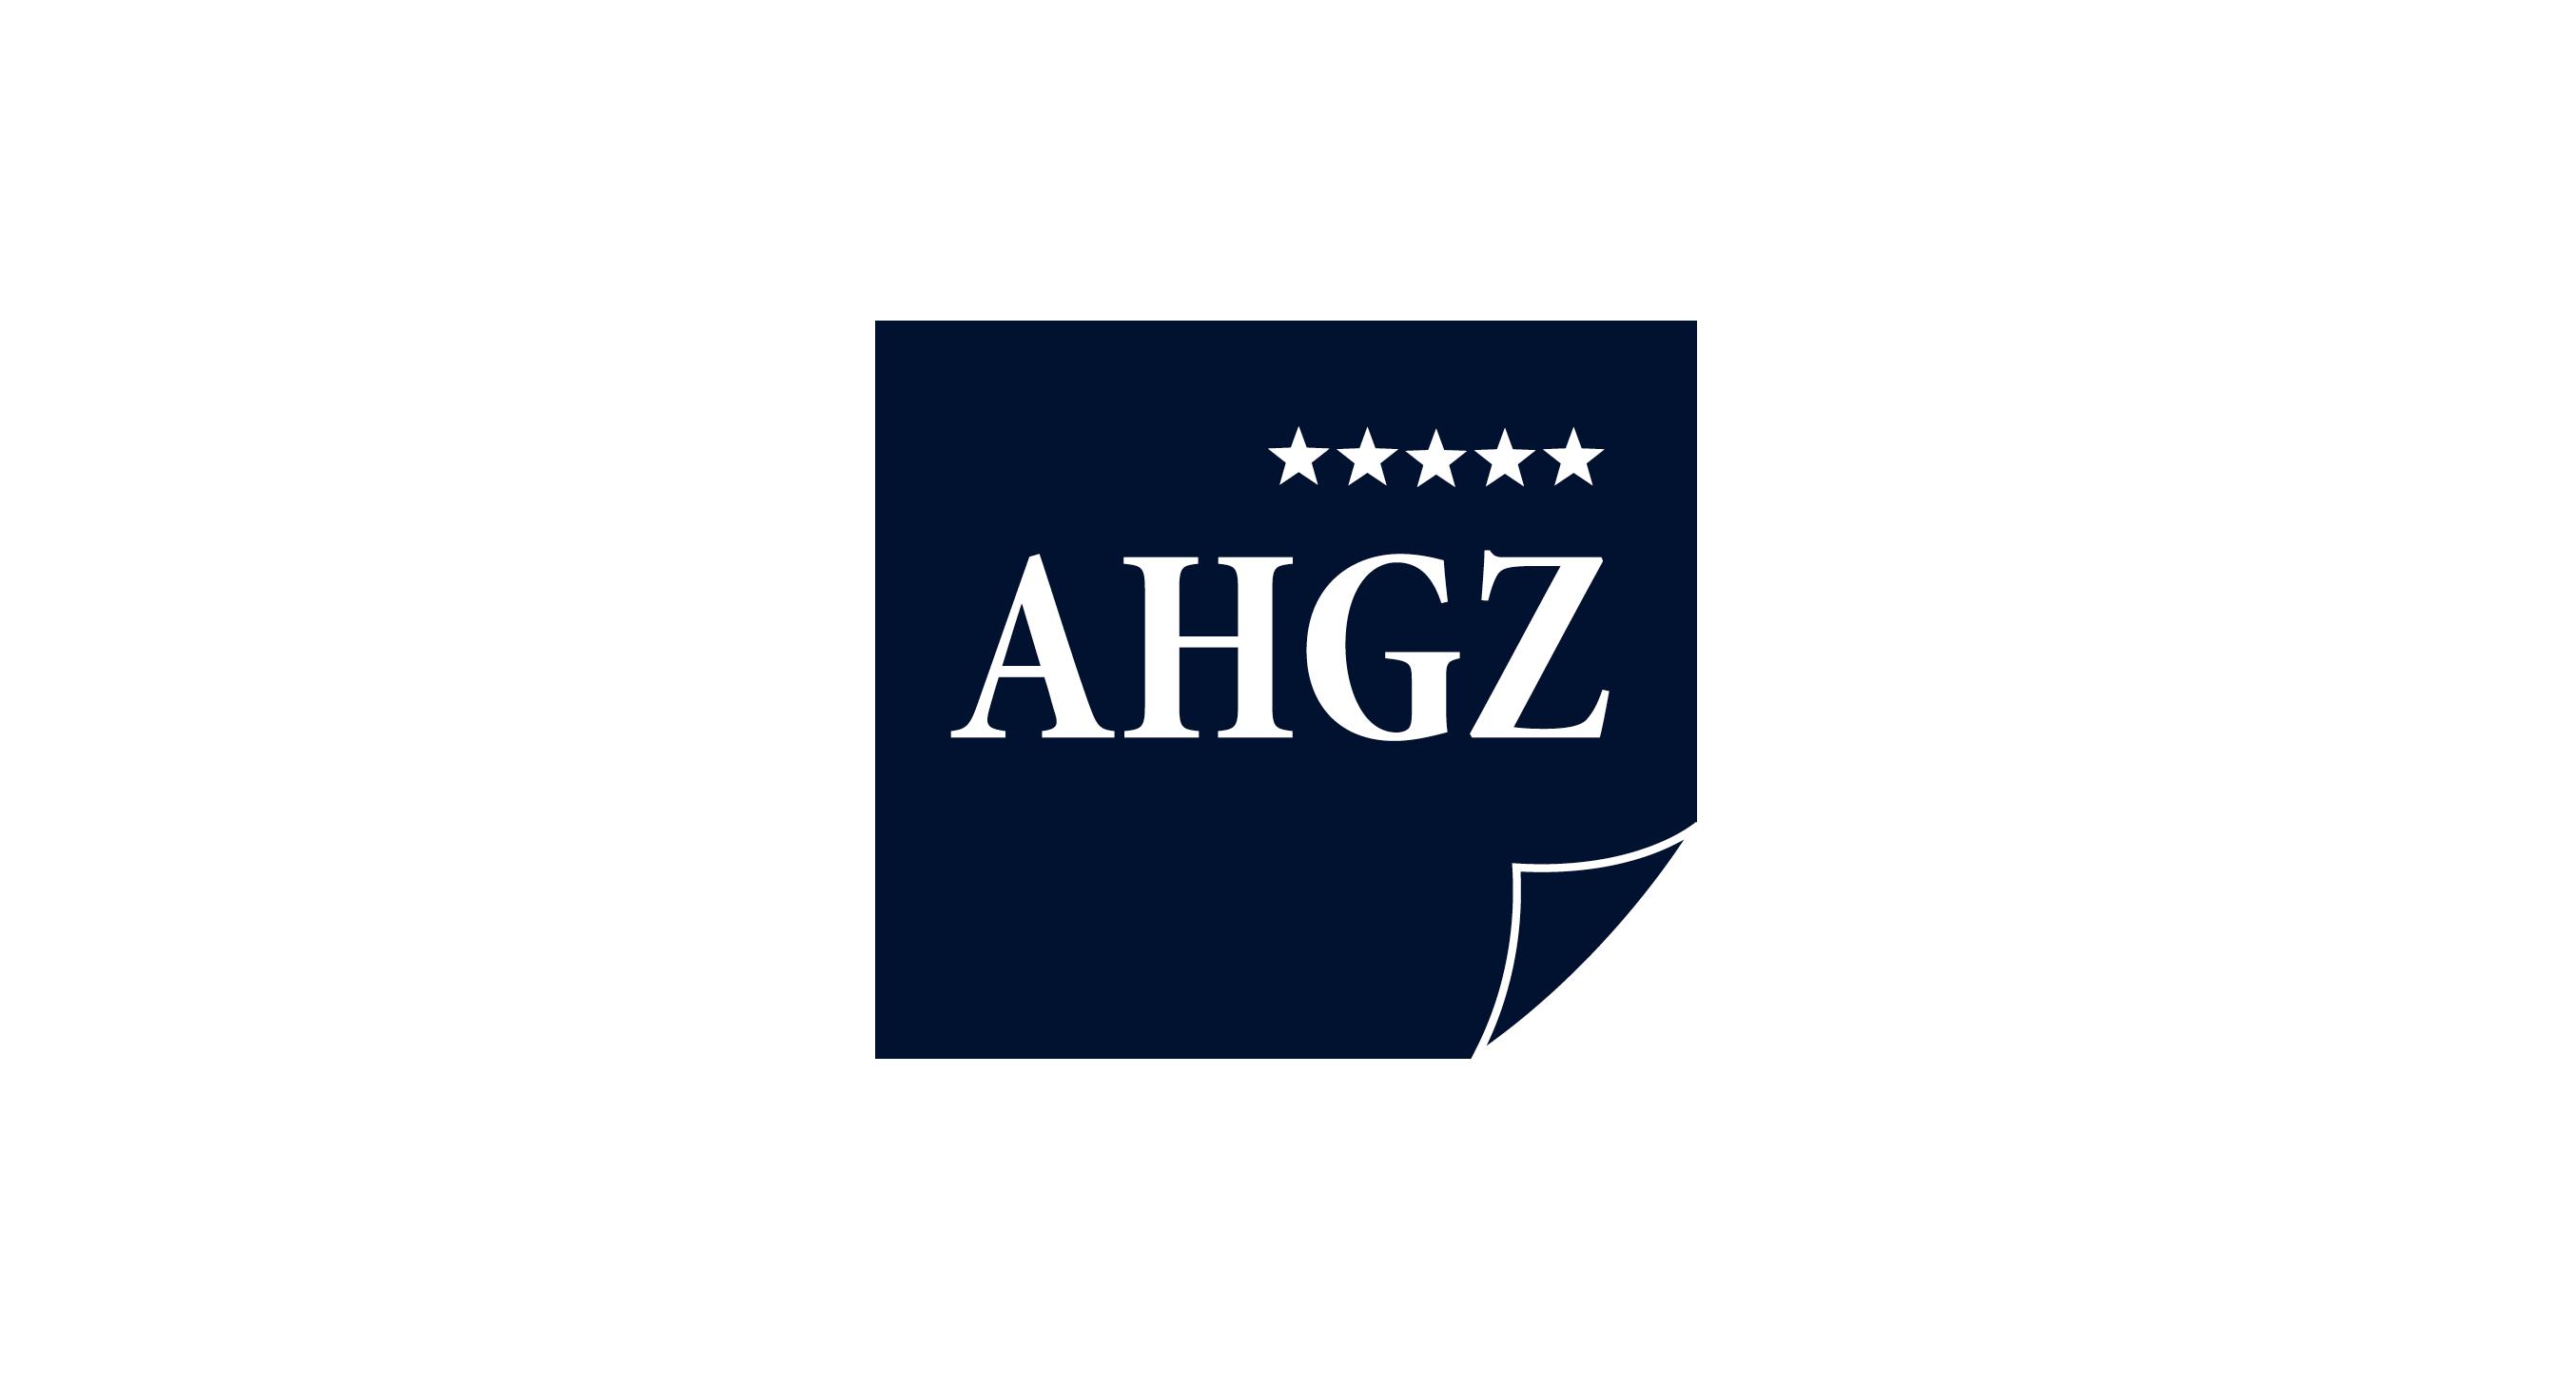 AHGZ logo